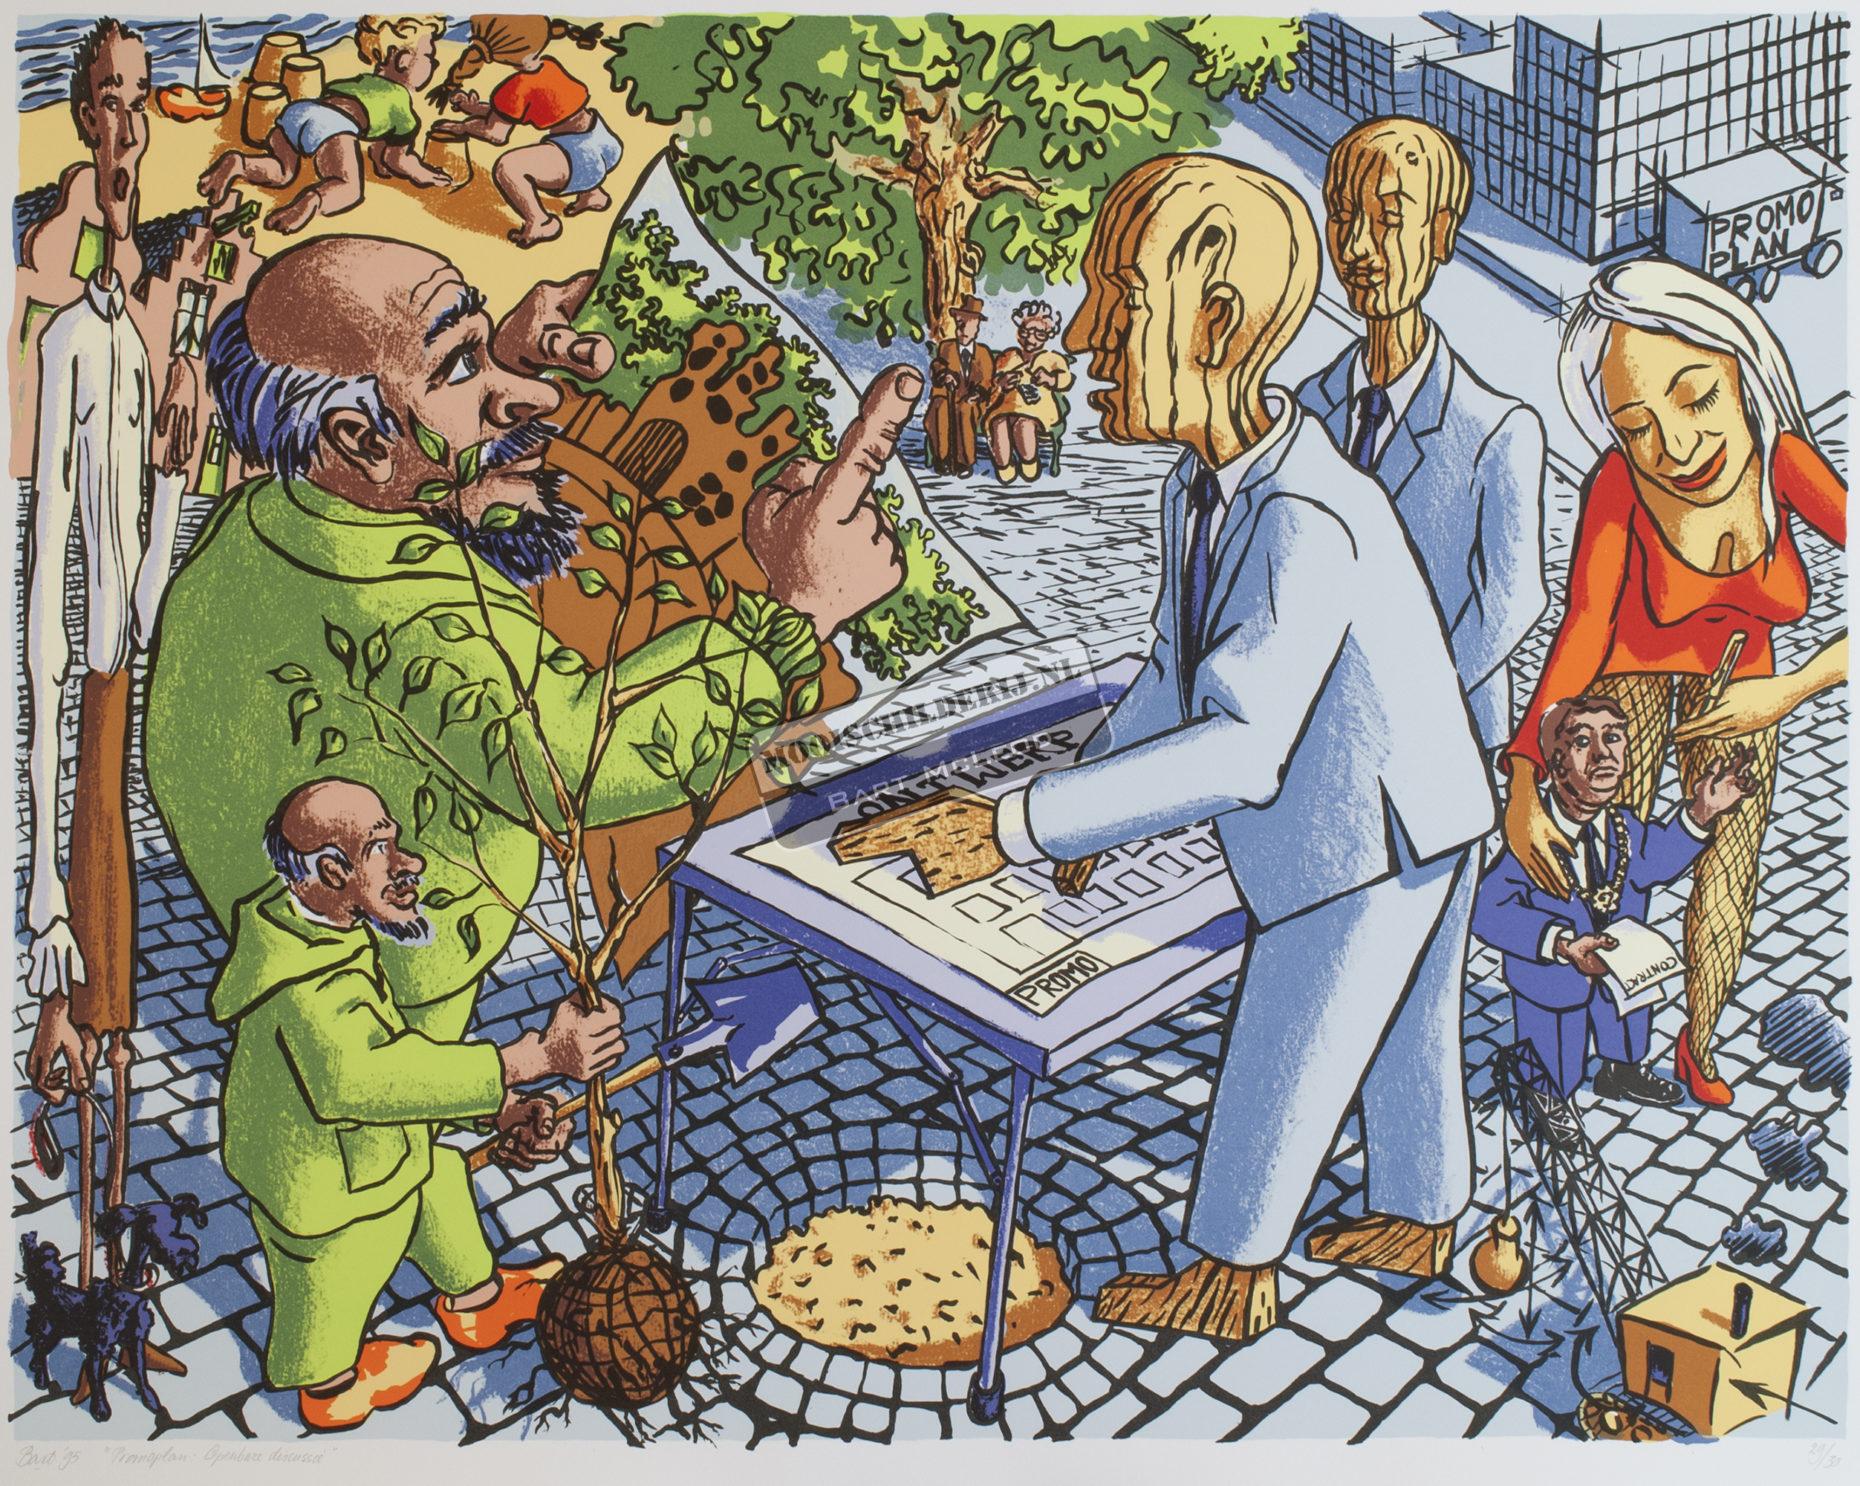 """Promoplan: Openbare Discussie"", 1995"